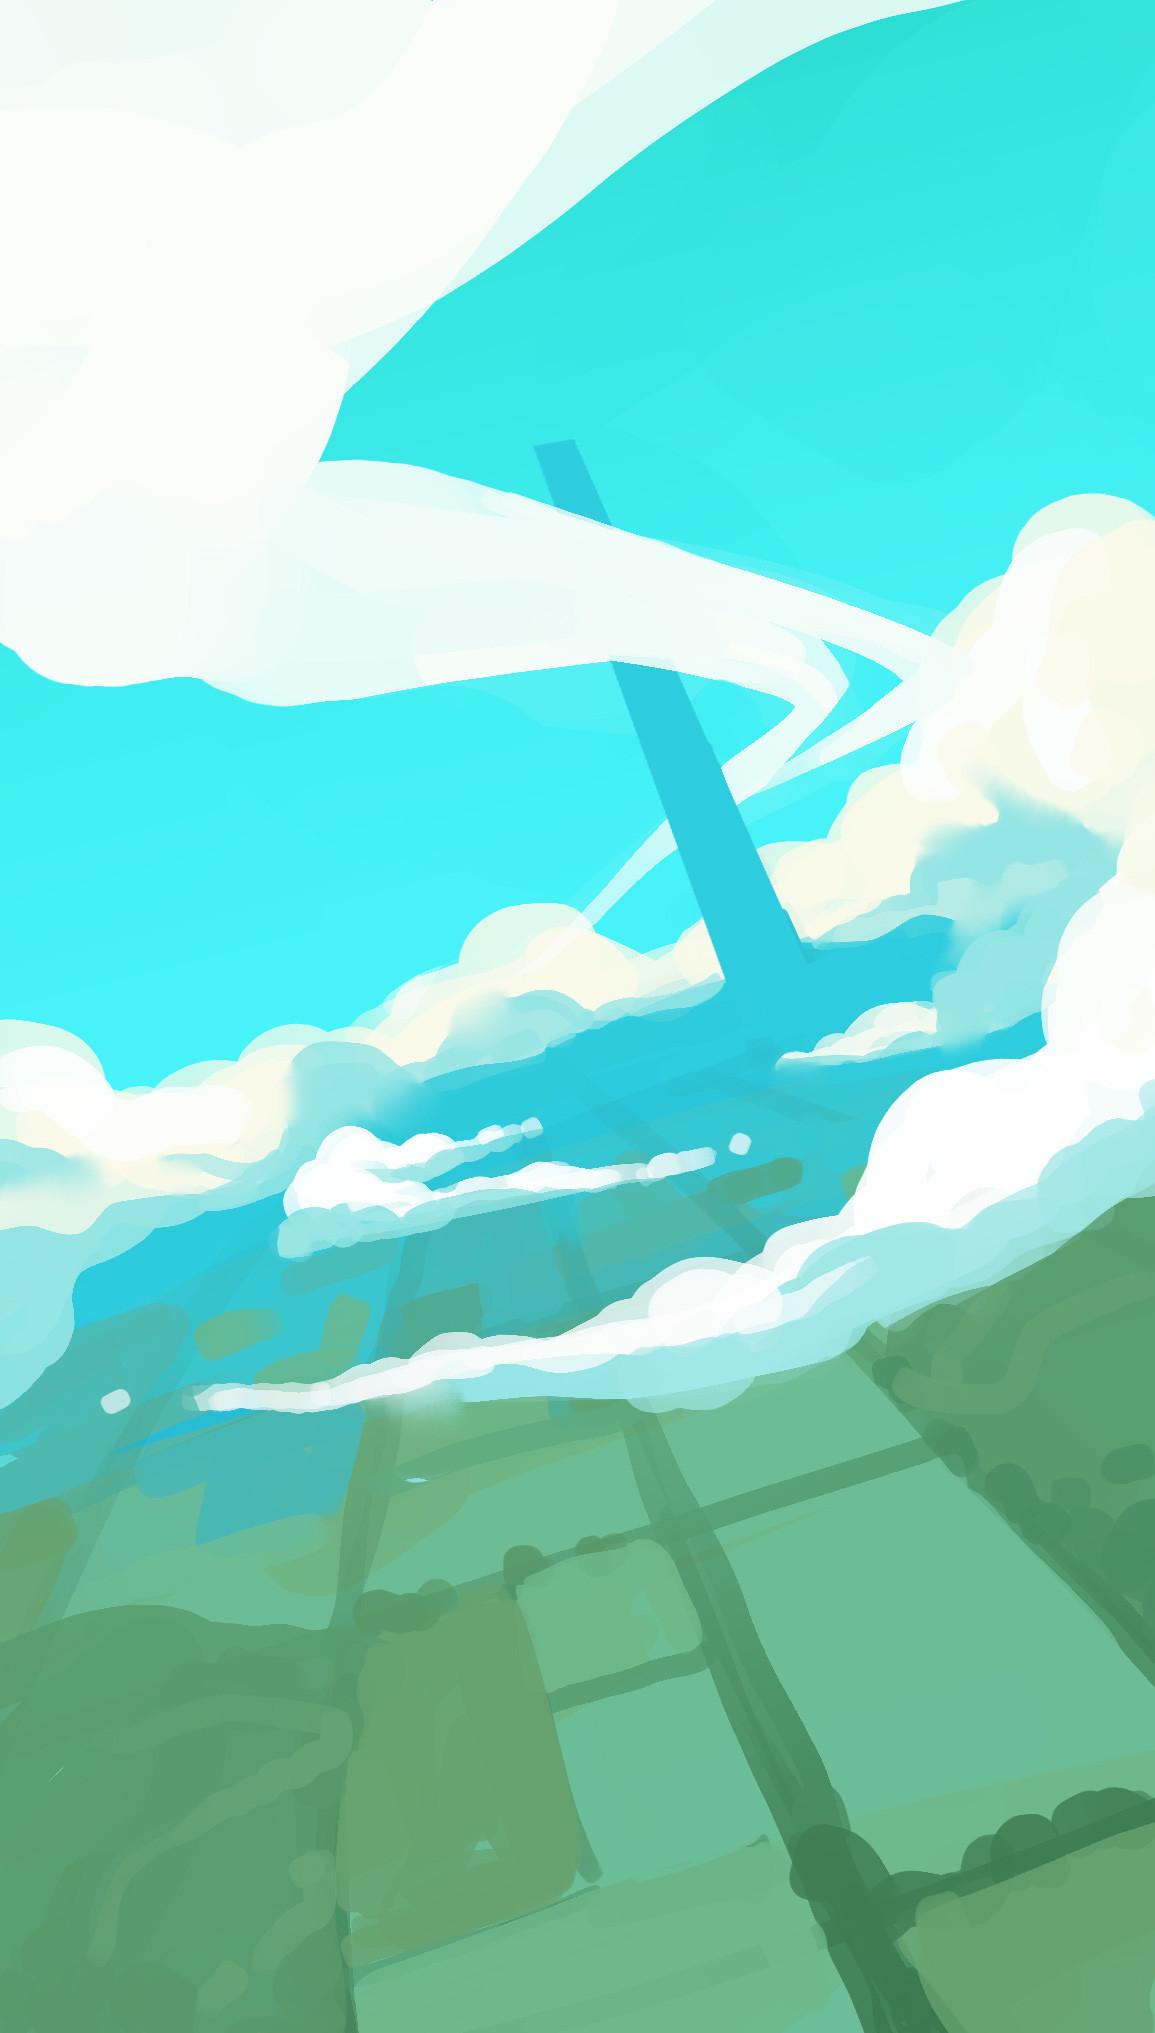 Samuel herb skybarge ideas 1